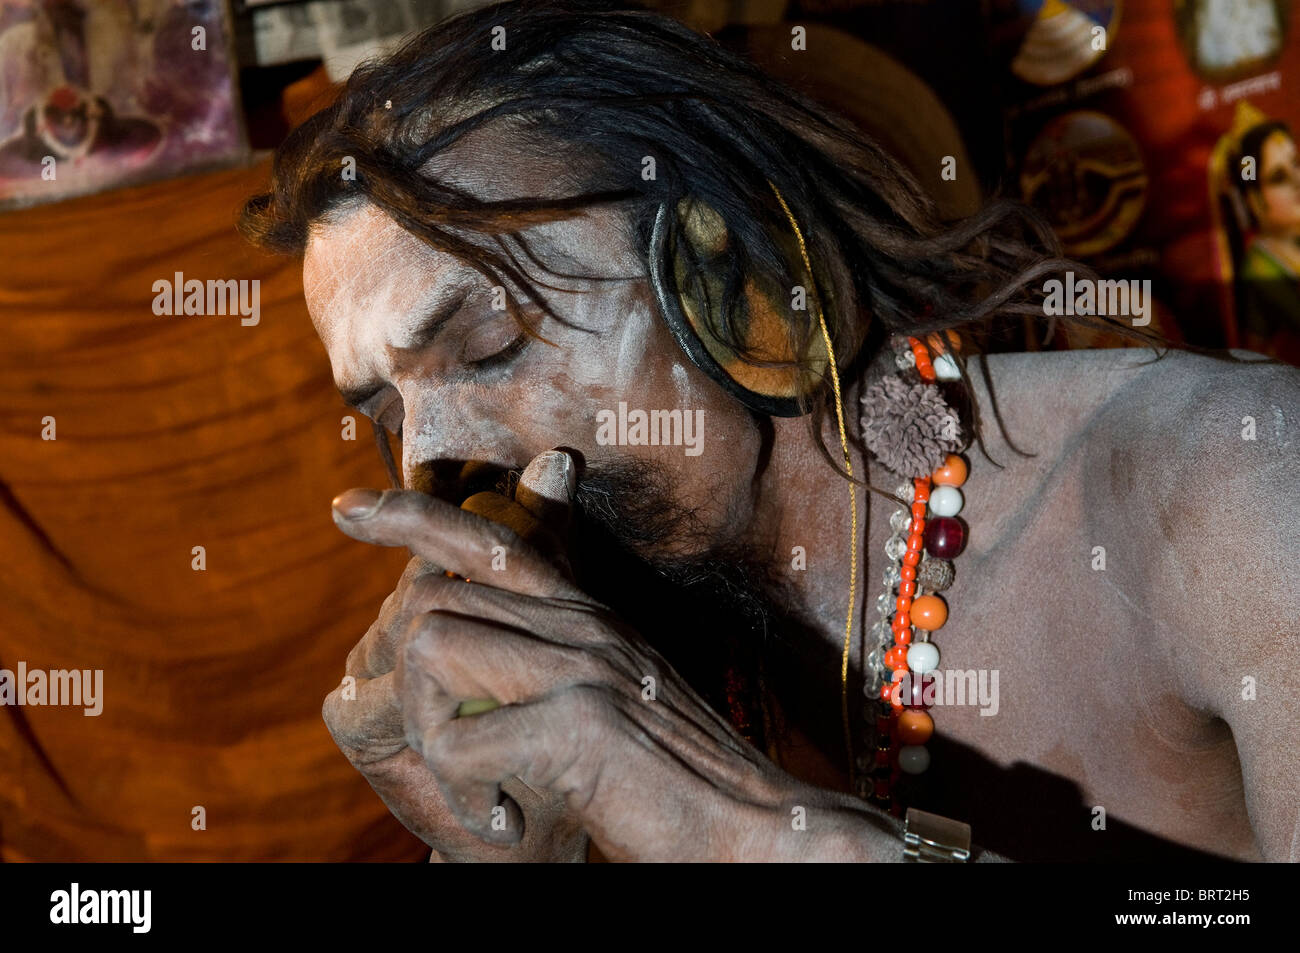 A Naga Sadhu smoking his chillum. - Stock Image